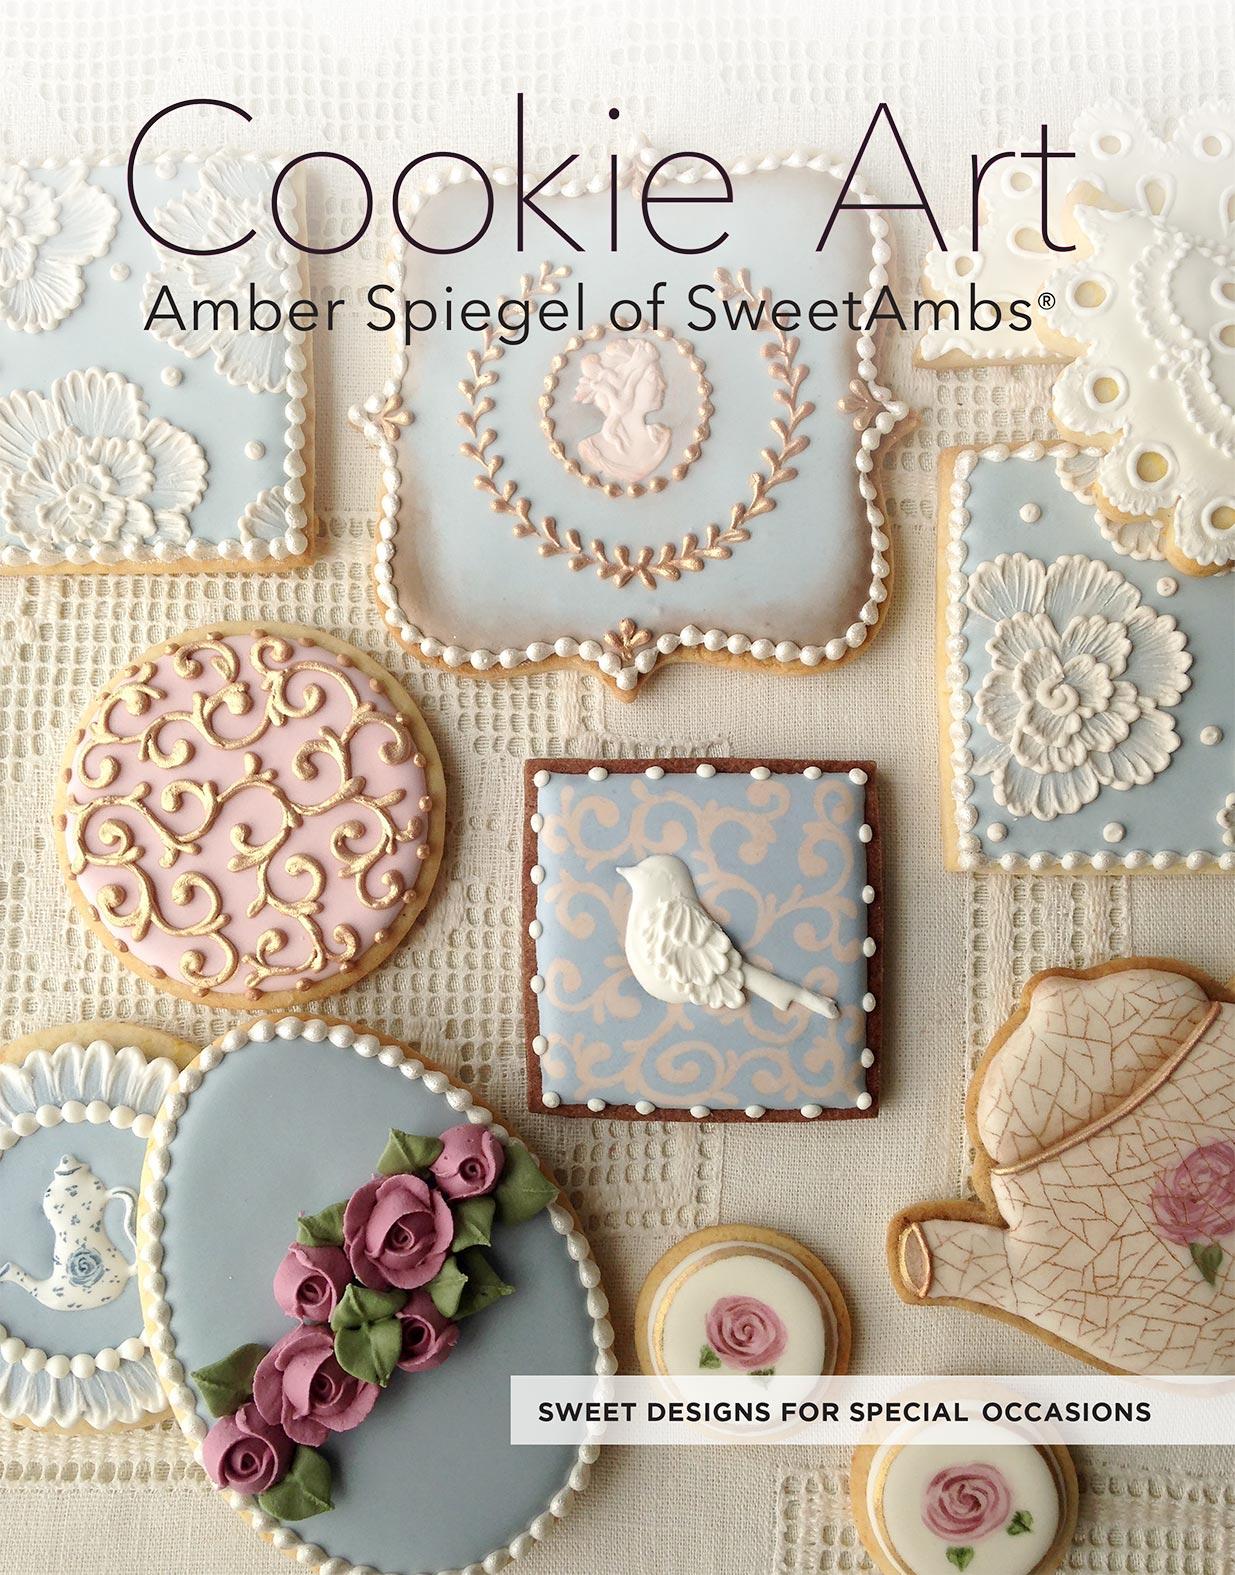 Cookie Decorating Book By Amber Spiegel - SweetAmbsSweetAmbs